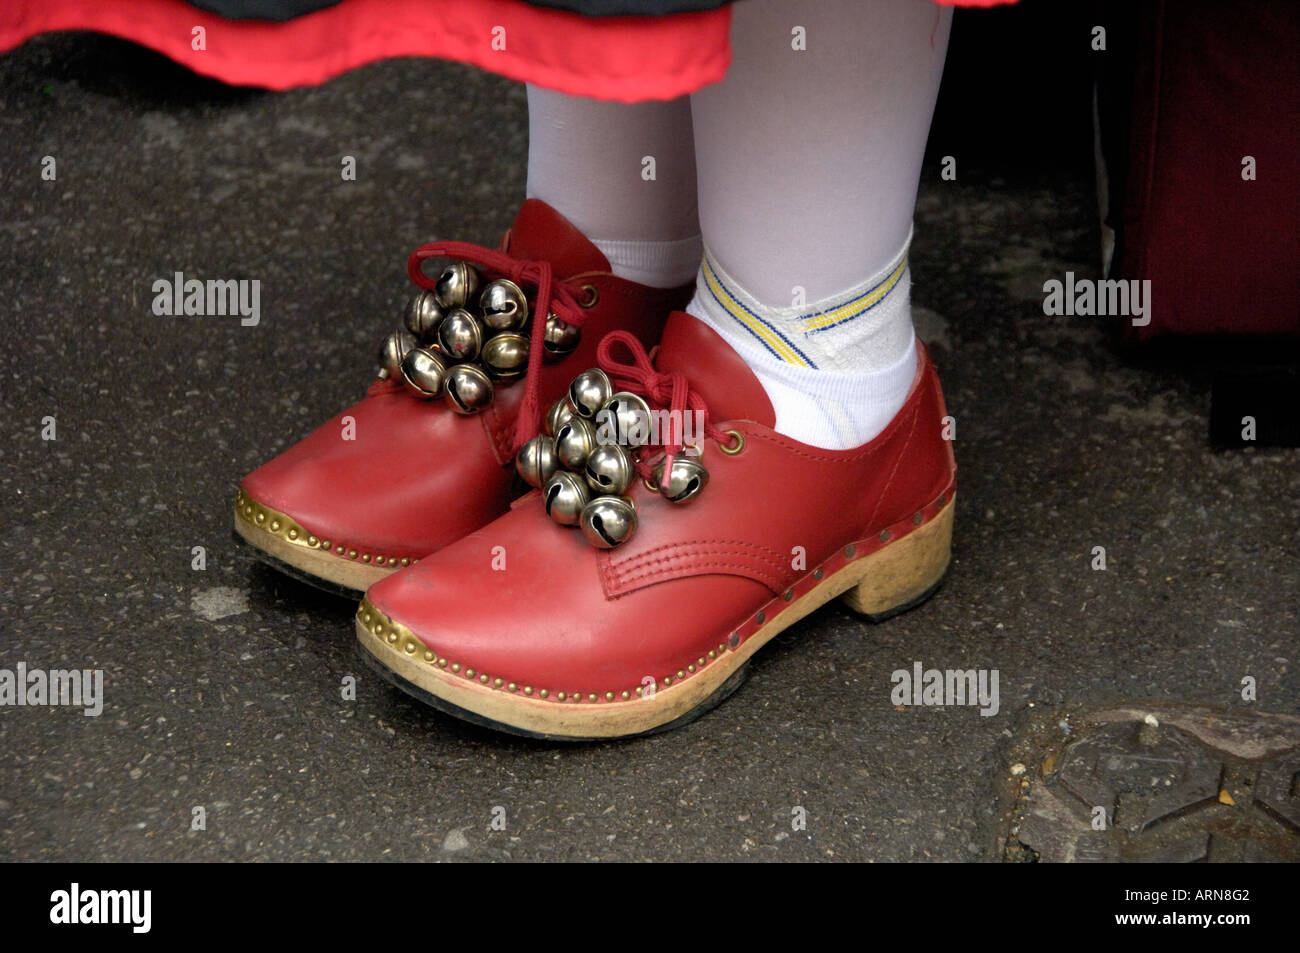 Buy Clog Dancing Shoes